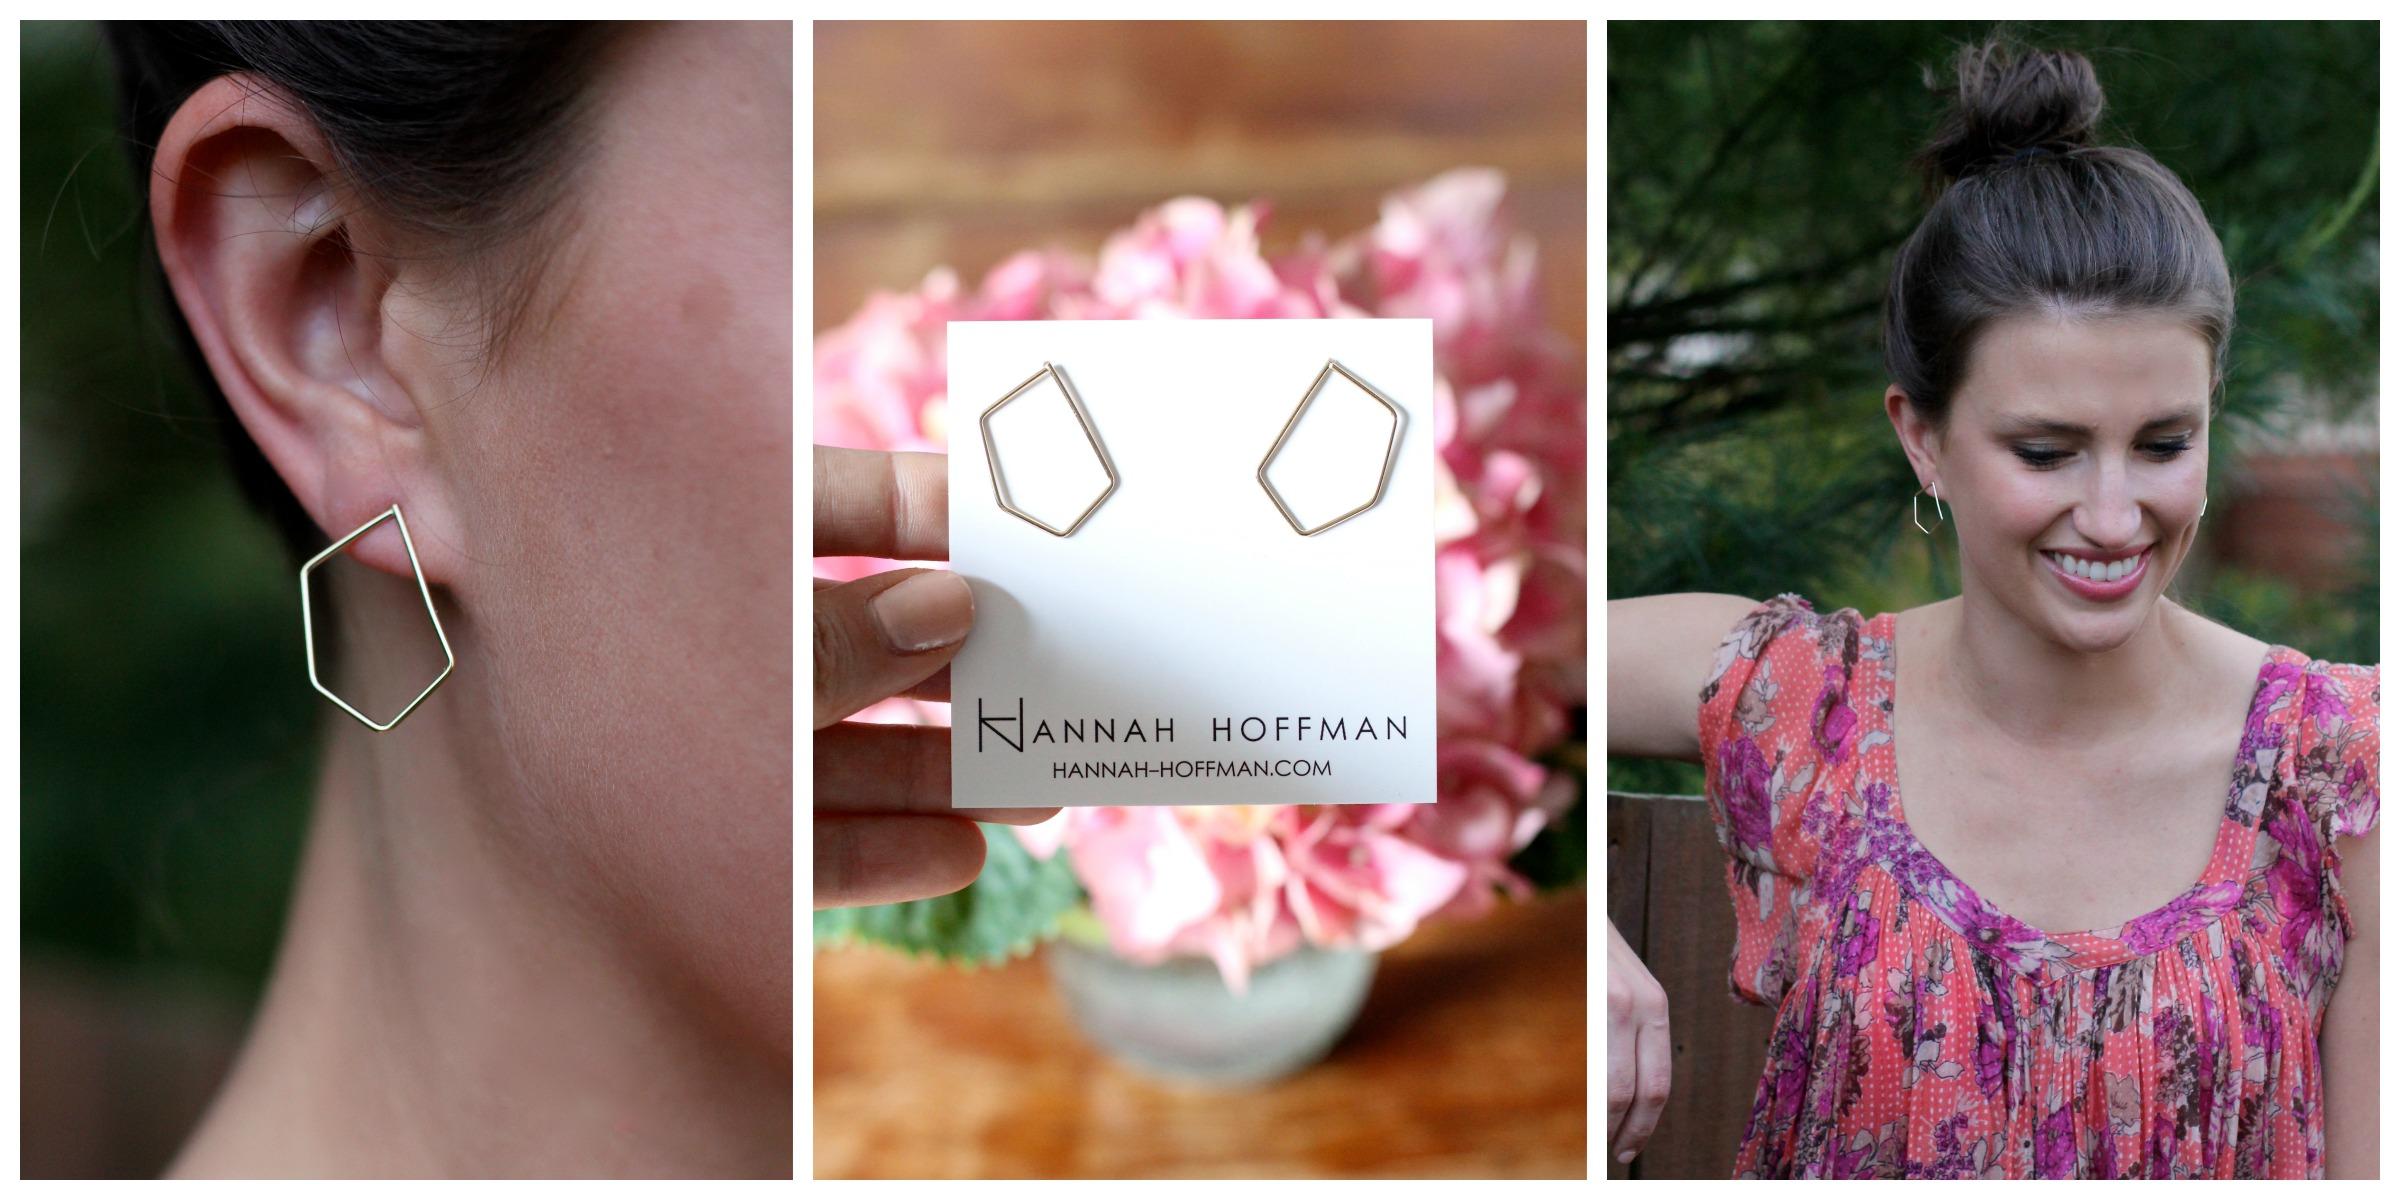 hannah-hoffman-jewelry-giveaway